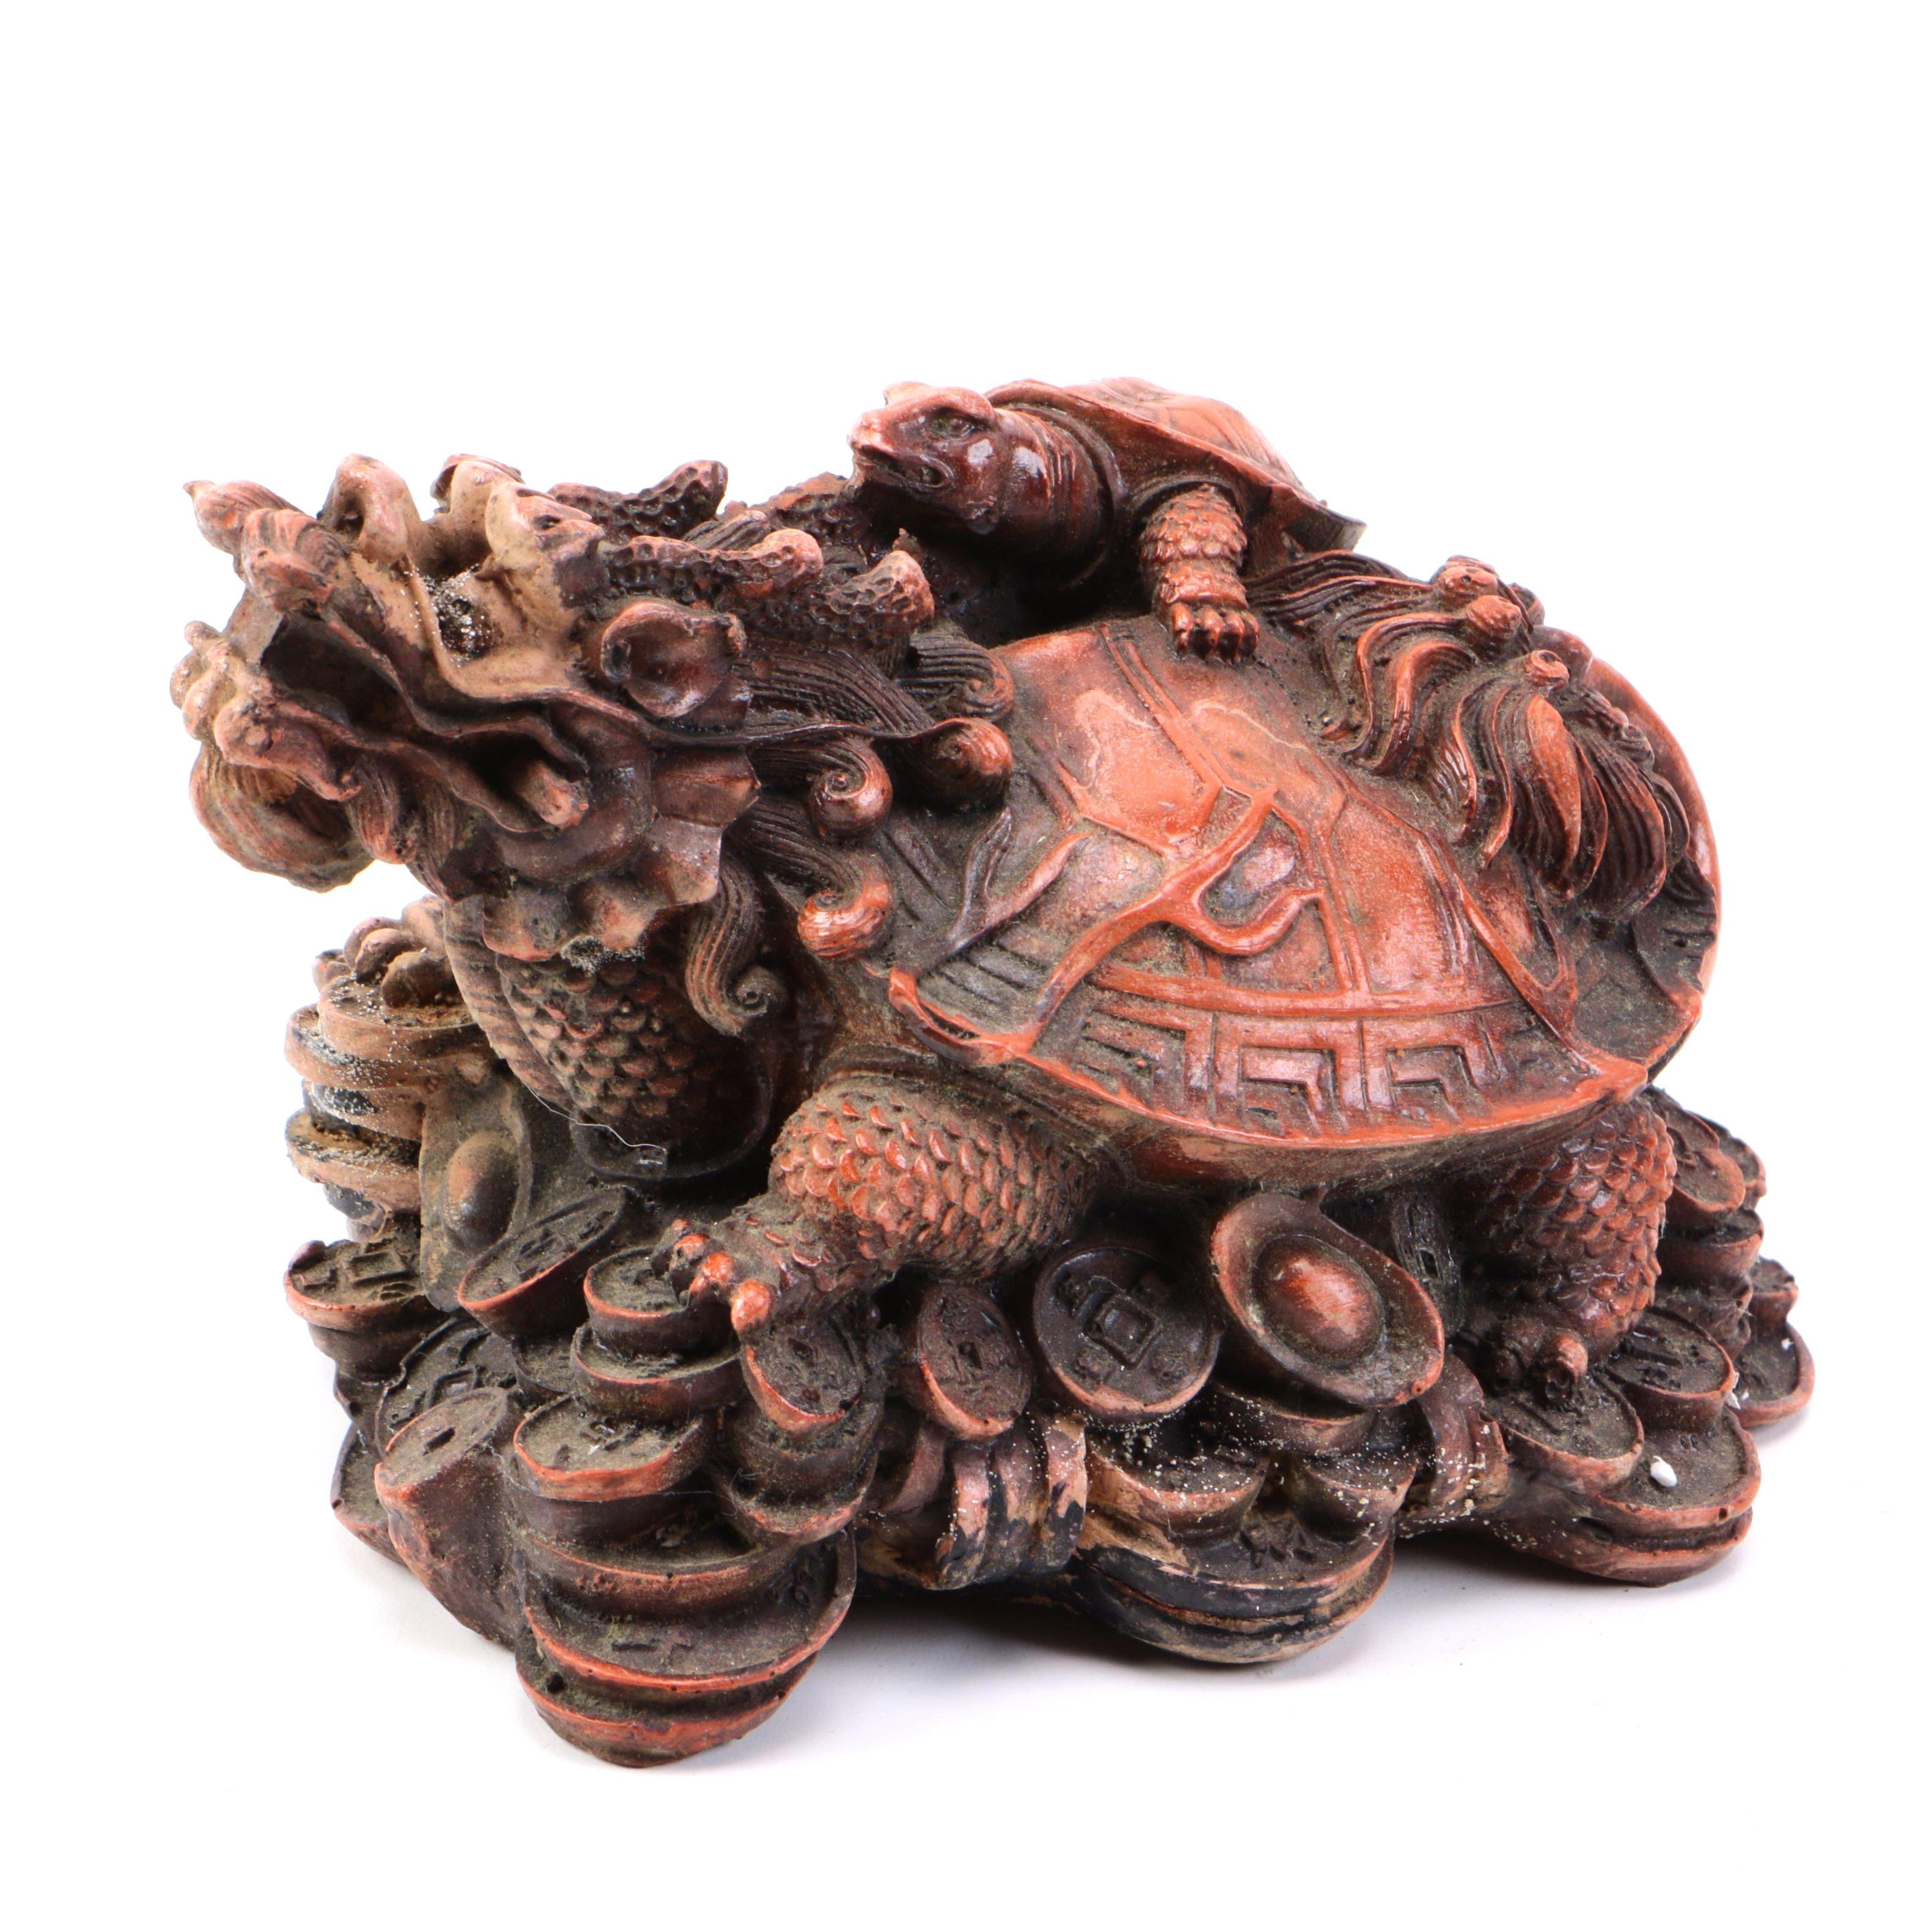 Chinese Dragon Turtle Figurine